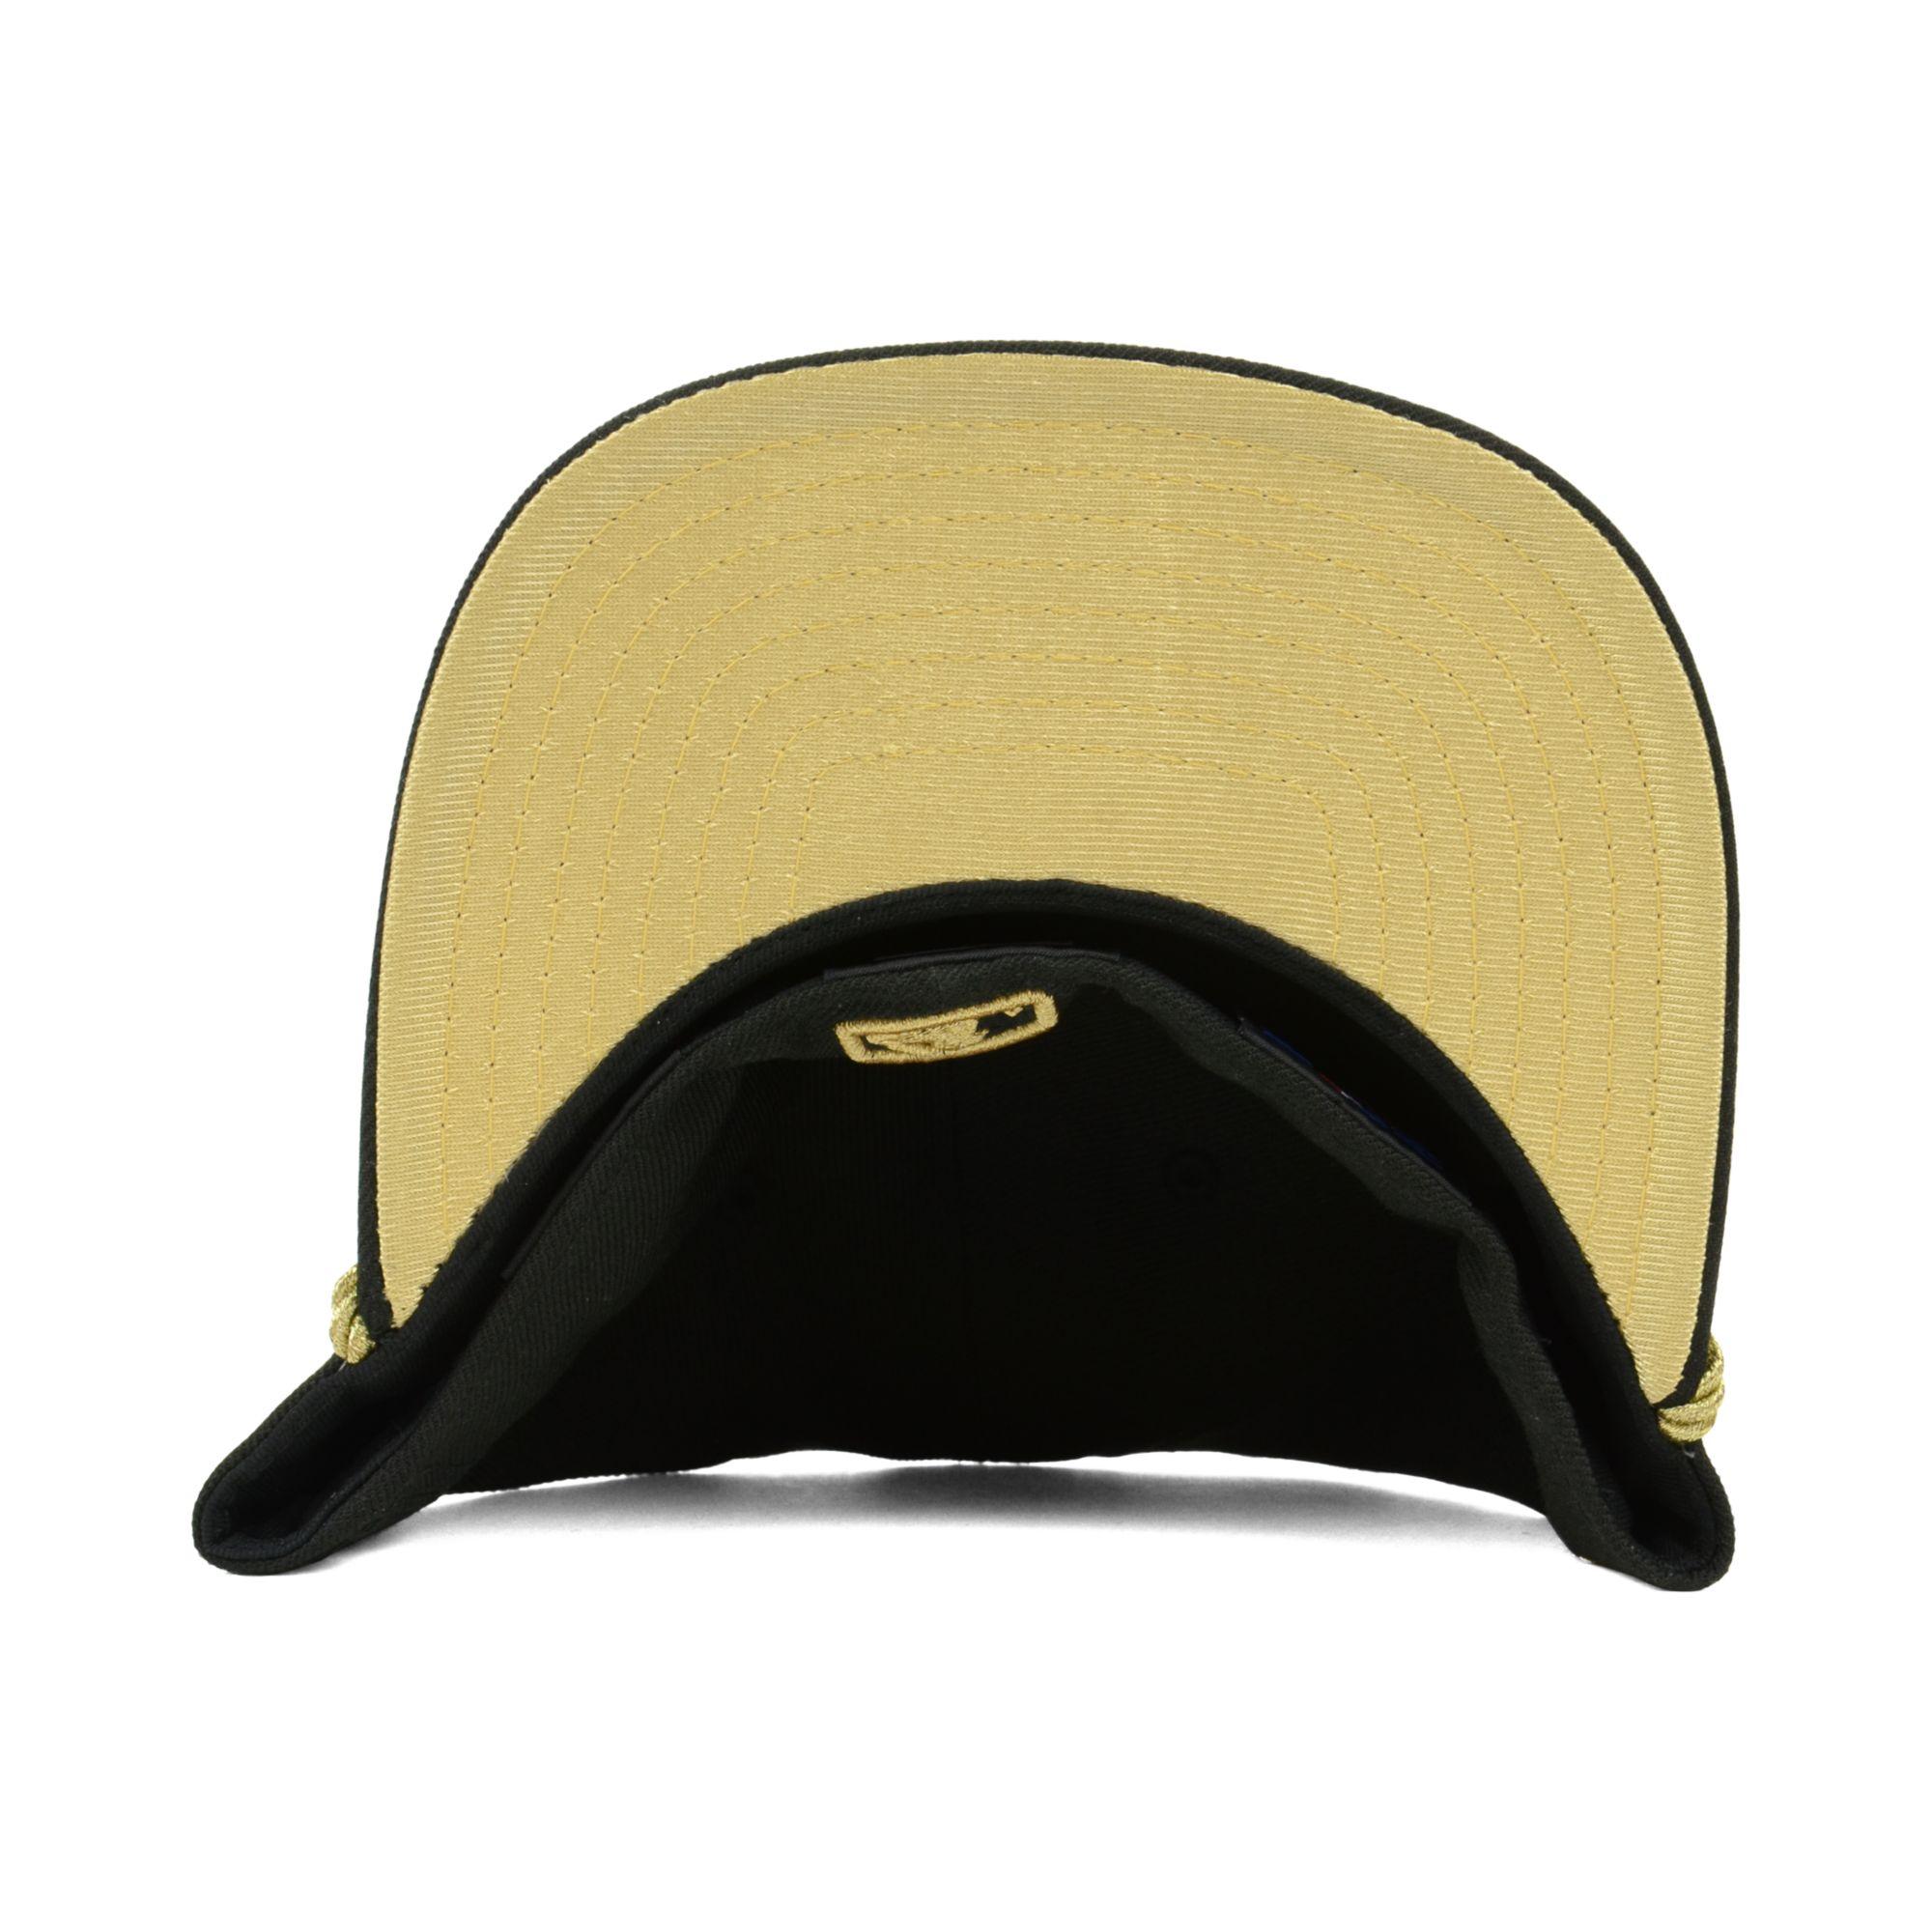 ... buy homepage chapel hats lyst ktz minnesota twins hall aframe 59fifty  cap in black for men 1b00f9e154f